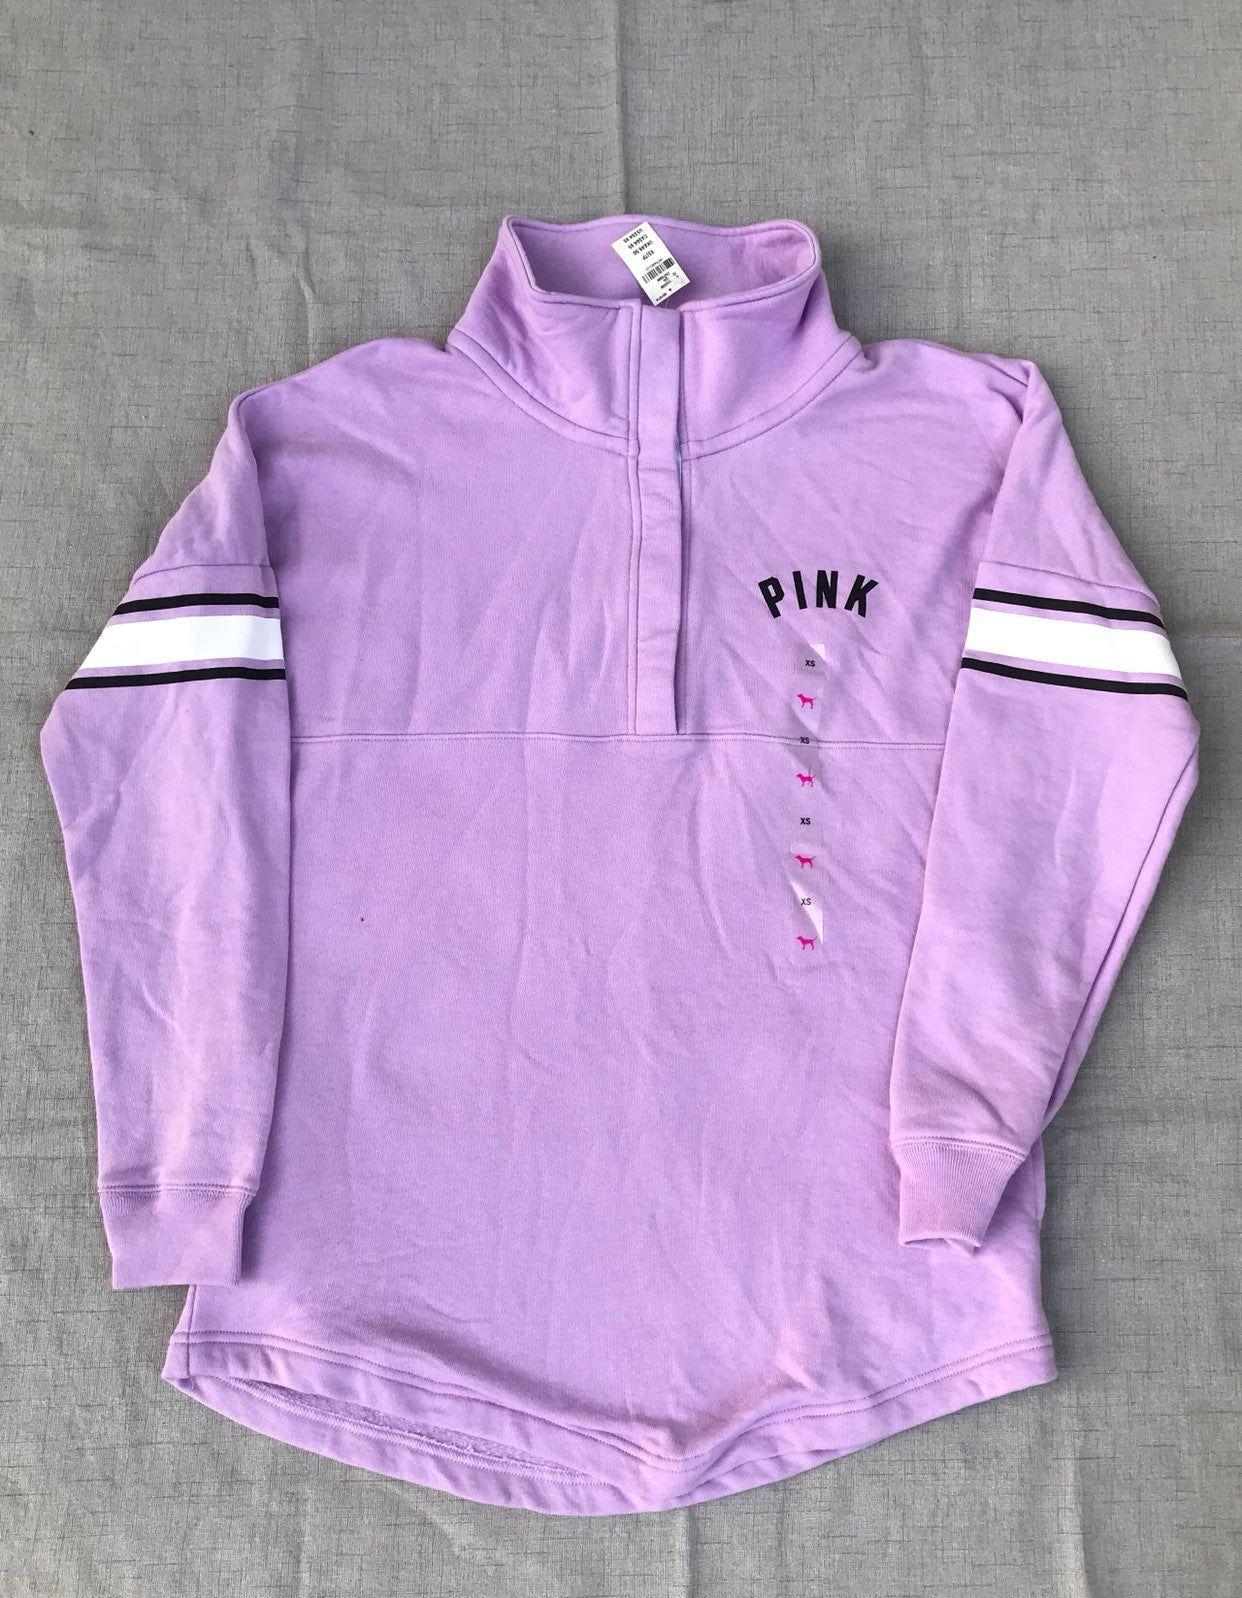 Brand New With Tags Lilac Lavender Purple Varsity Crewneck Sweatshirt Runs Bigger Has Snap Button Victoria Secret Pink Victoria Secret Outfits Pink Crewneck [ 1598 x 1242 Pixel ]